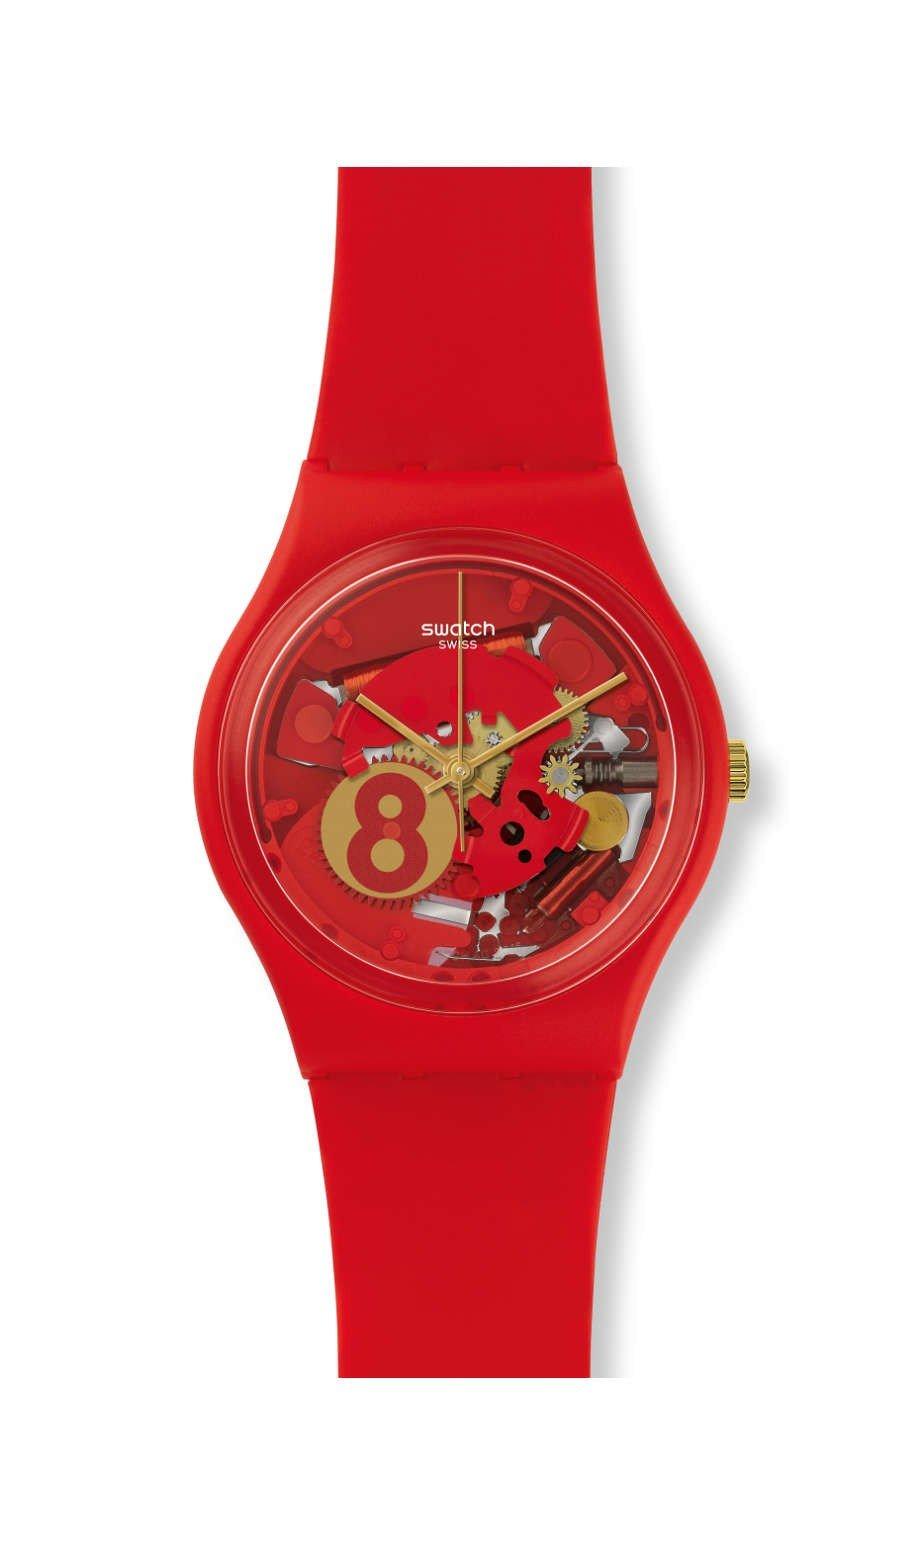 Swatch Ocho para suerte Reloj gr166